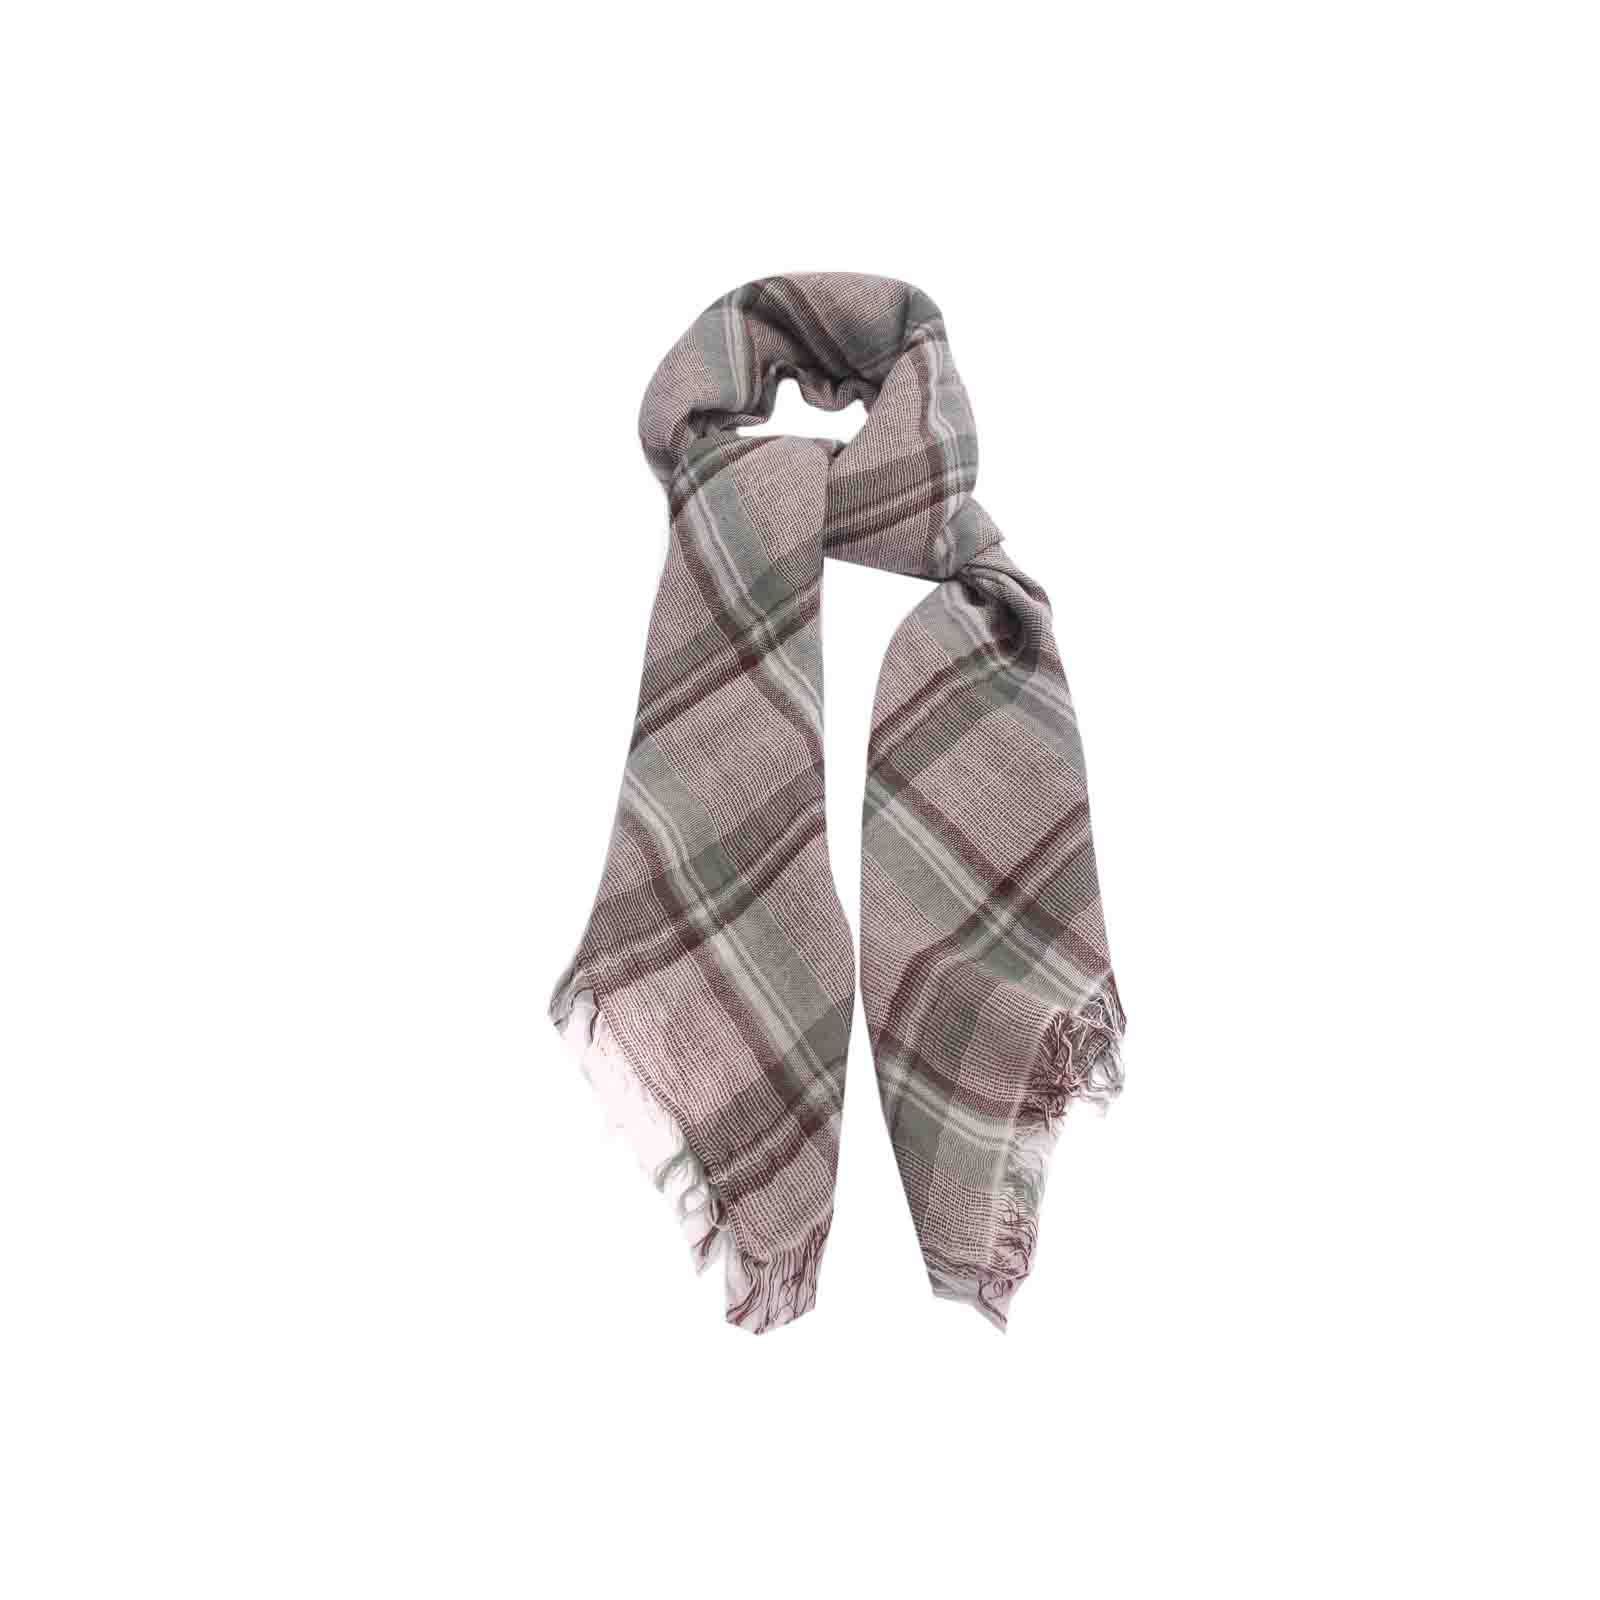 Lenço Xadrez e Verde #lenços #lenço #scarf #scarfs